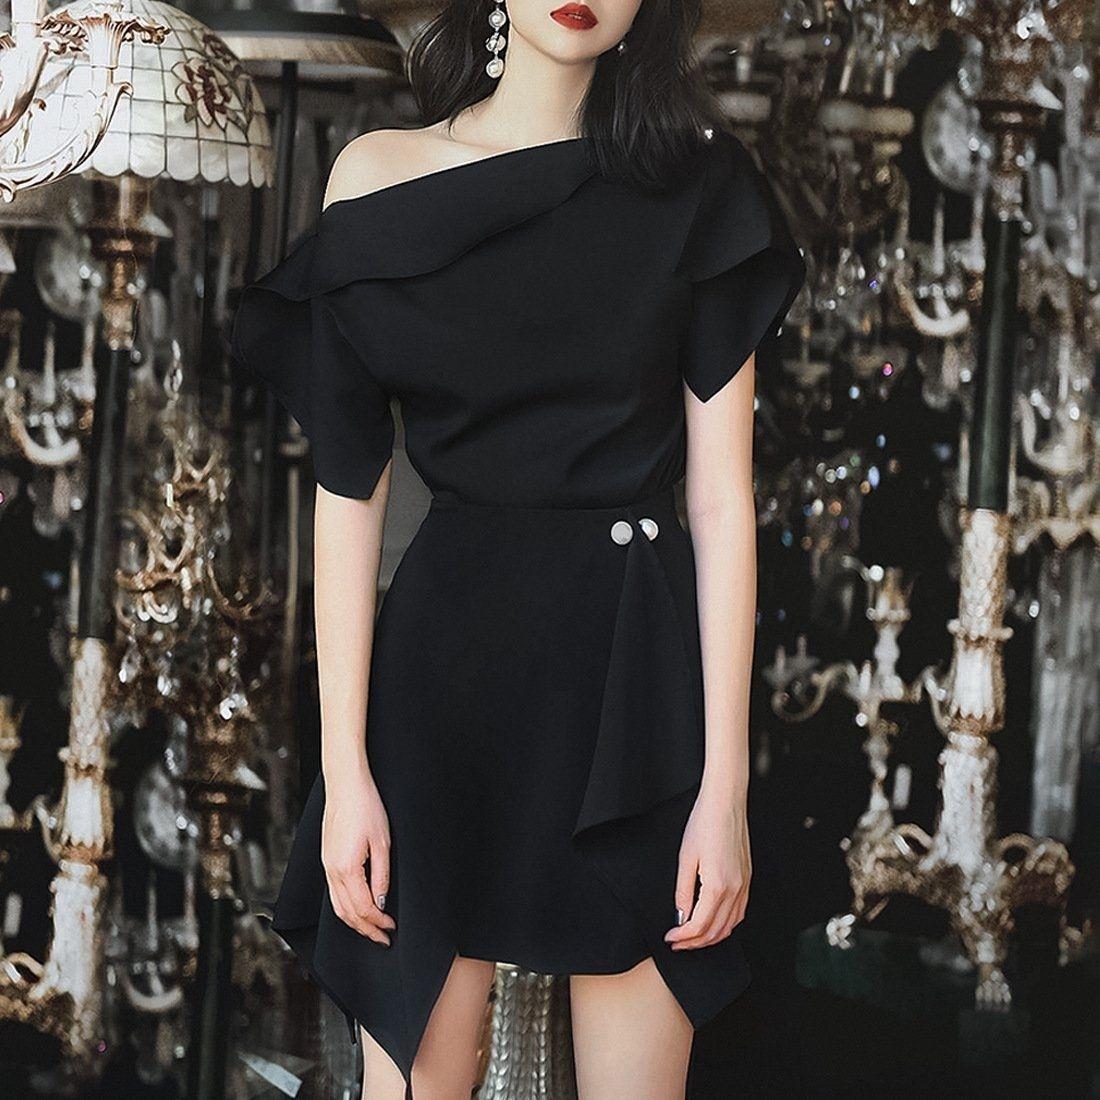 estate stile Hepburn di izUtT donne francesi due pezzi jishoulder estate delle donne 8798 mondana di misura sottile vestito irregolare ha 8798